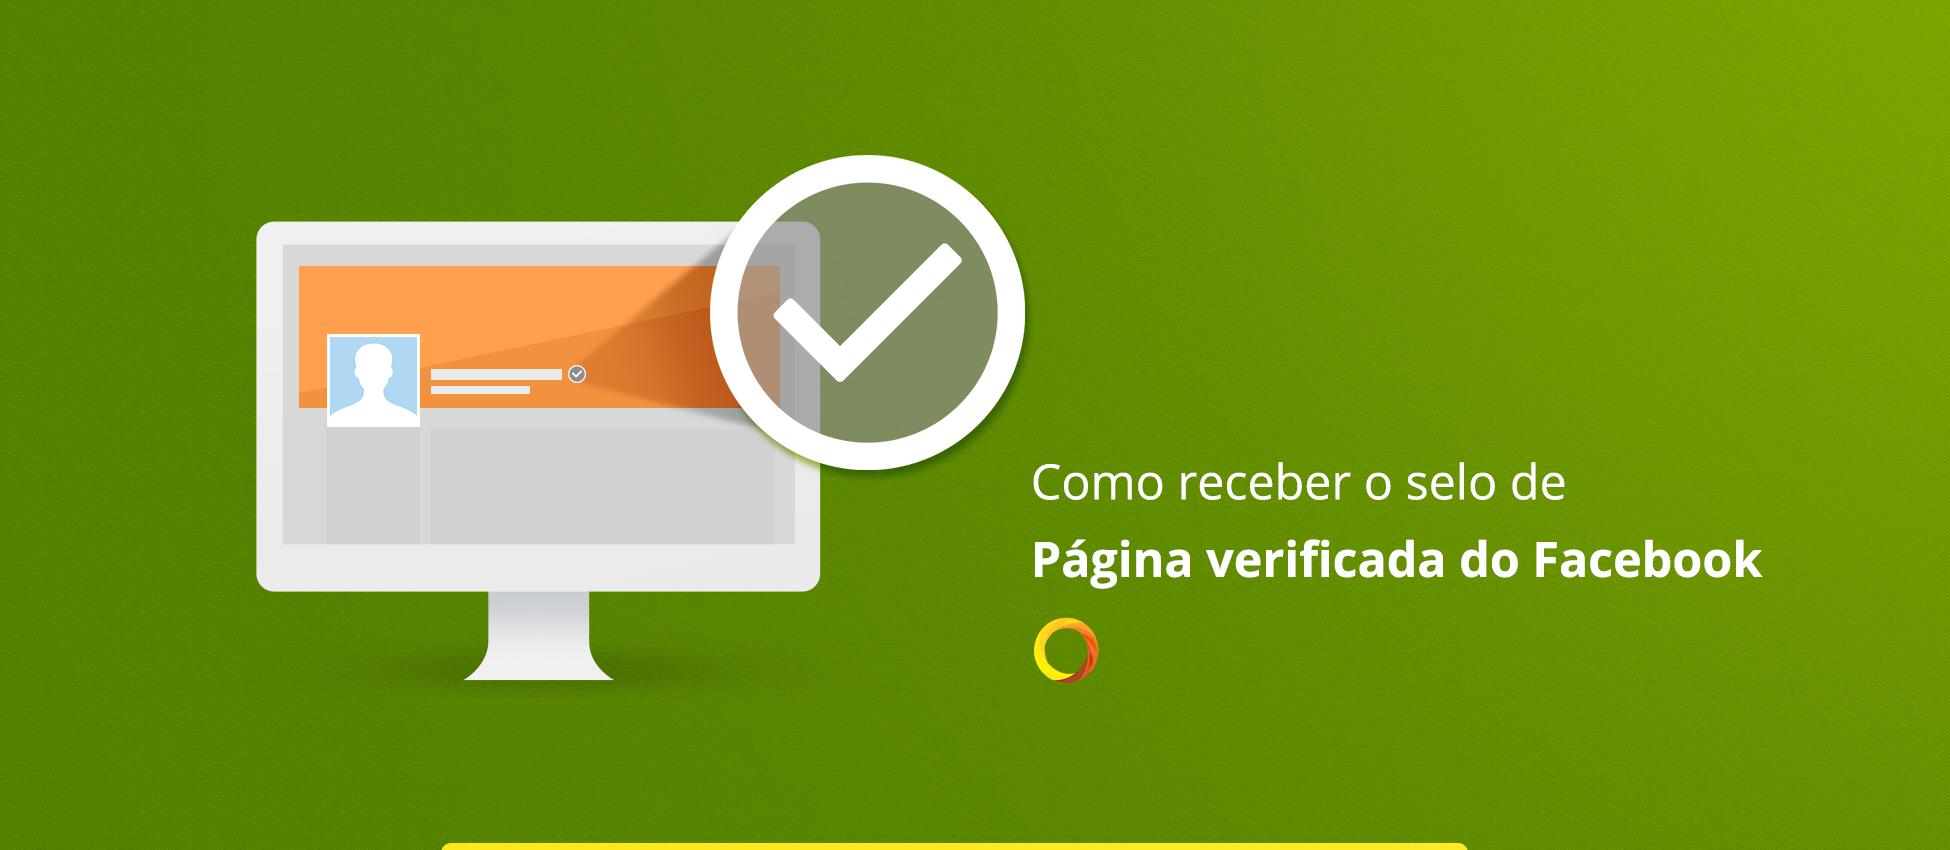 Como receber o selo de Página verificada do Facebook